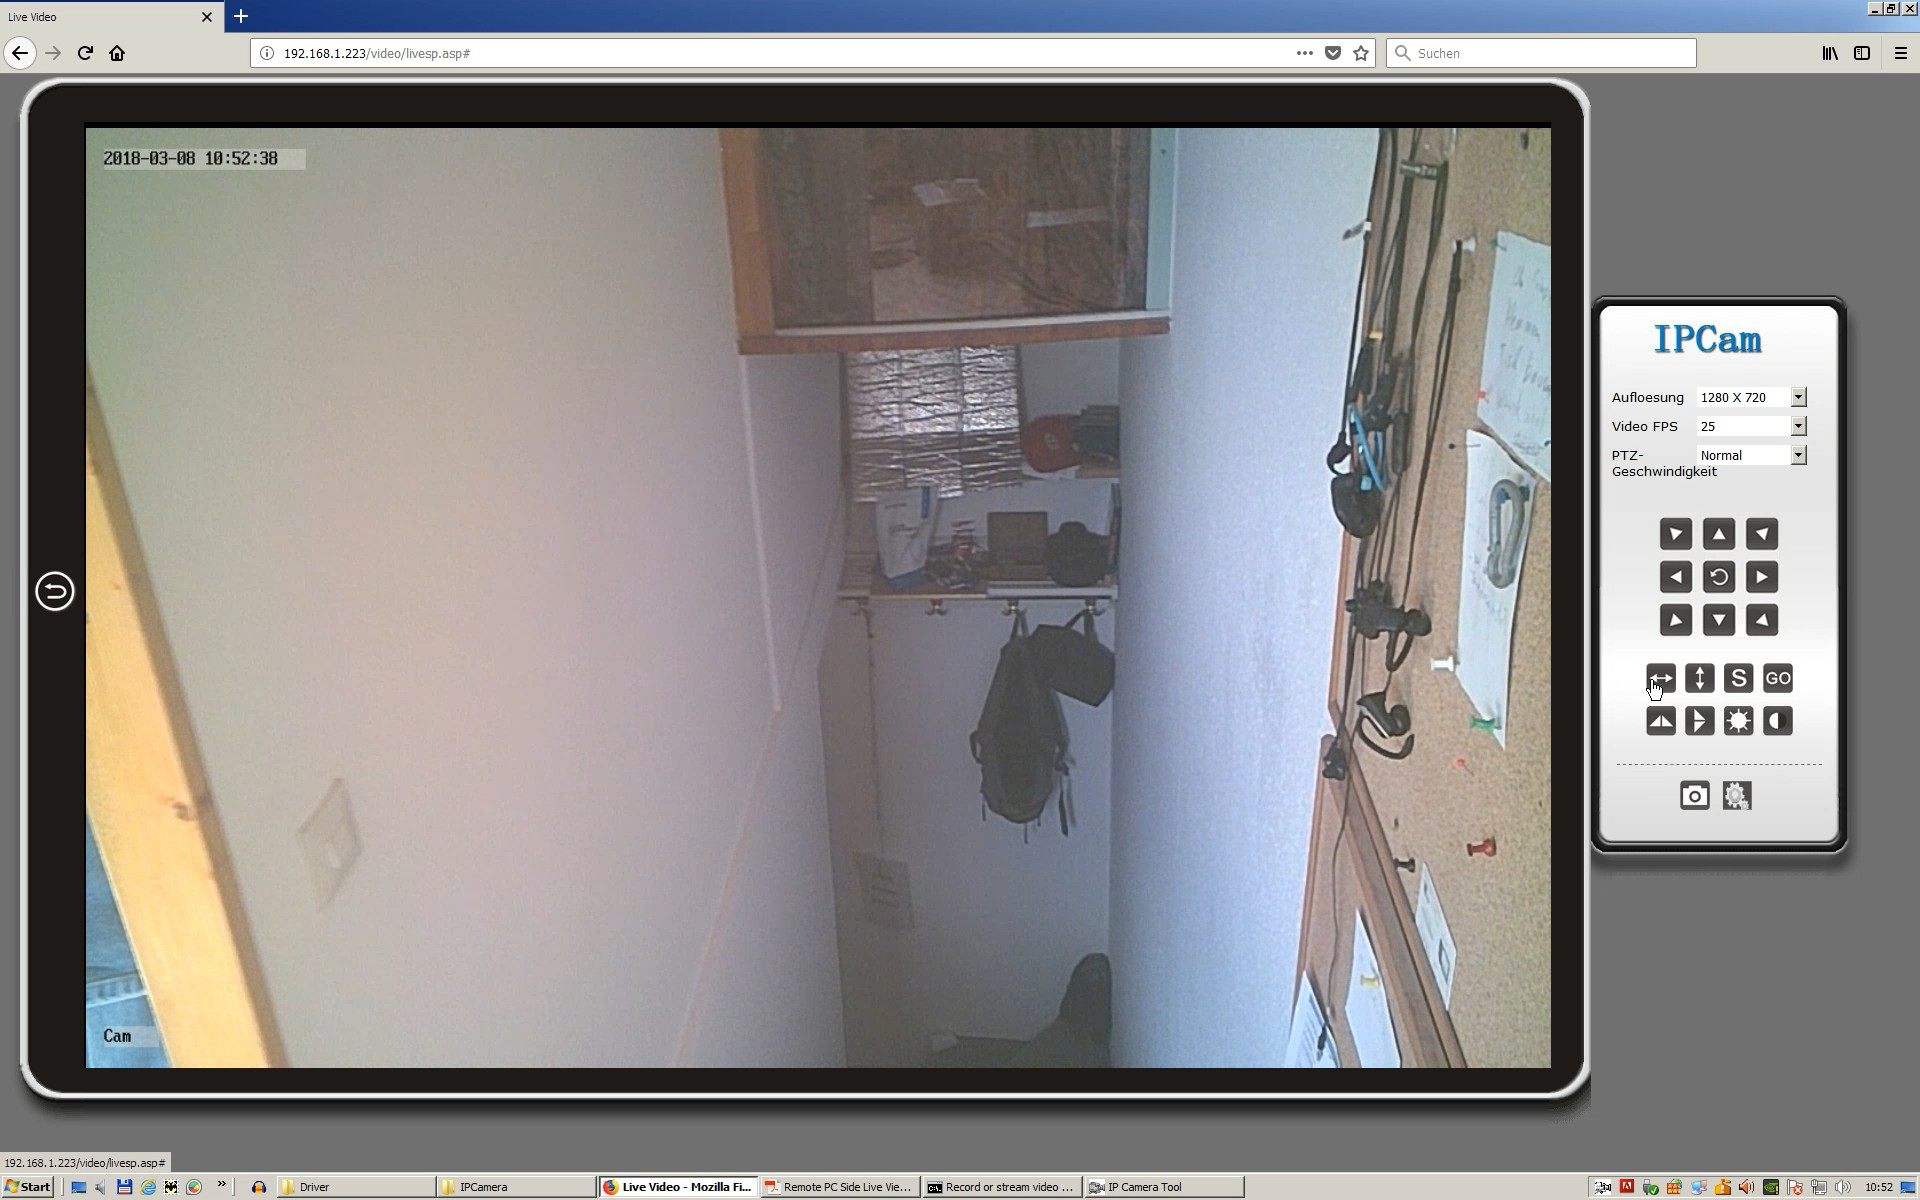 blackboxcam rotate mini im test spionagekamera mini berwachungskamera mit app wlan kamera. Black Bedroom Furniture Sets. Home Design Ideas